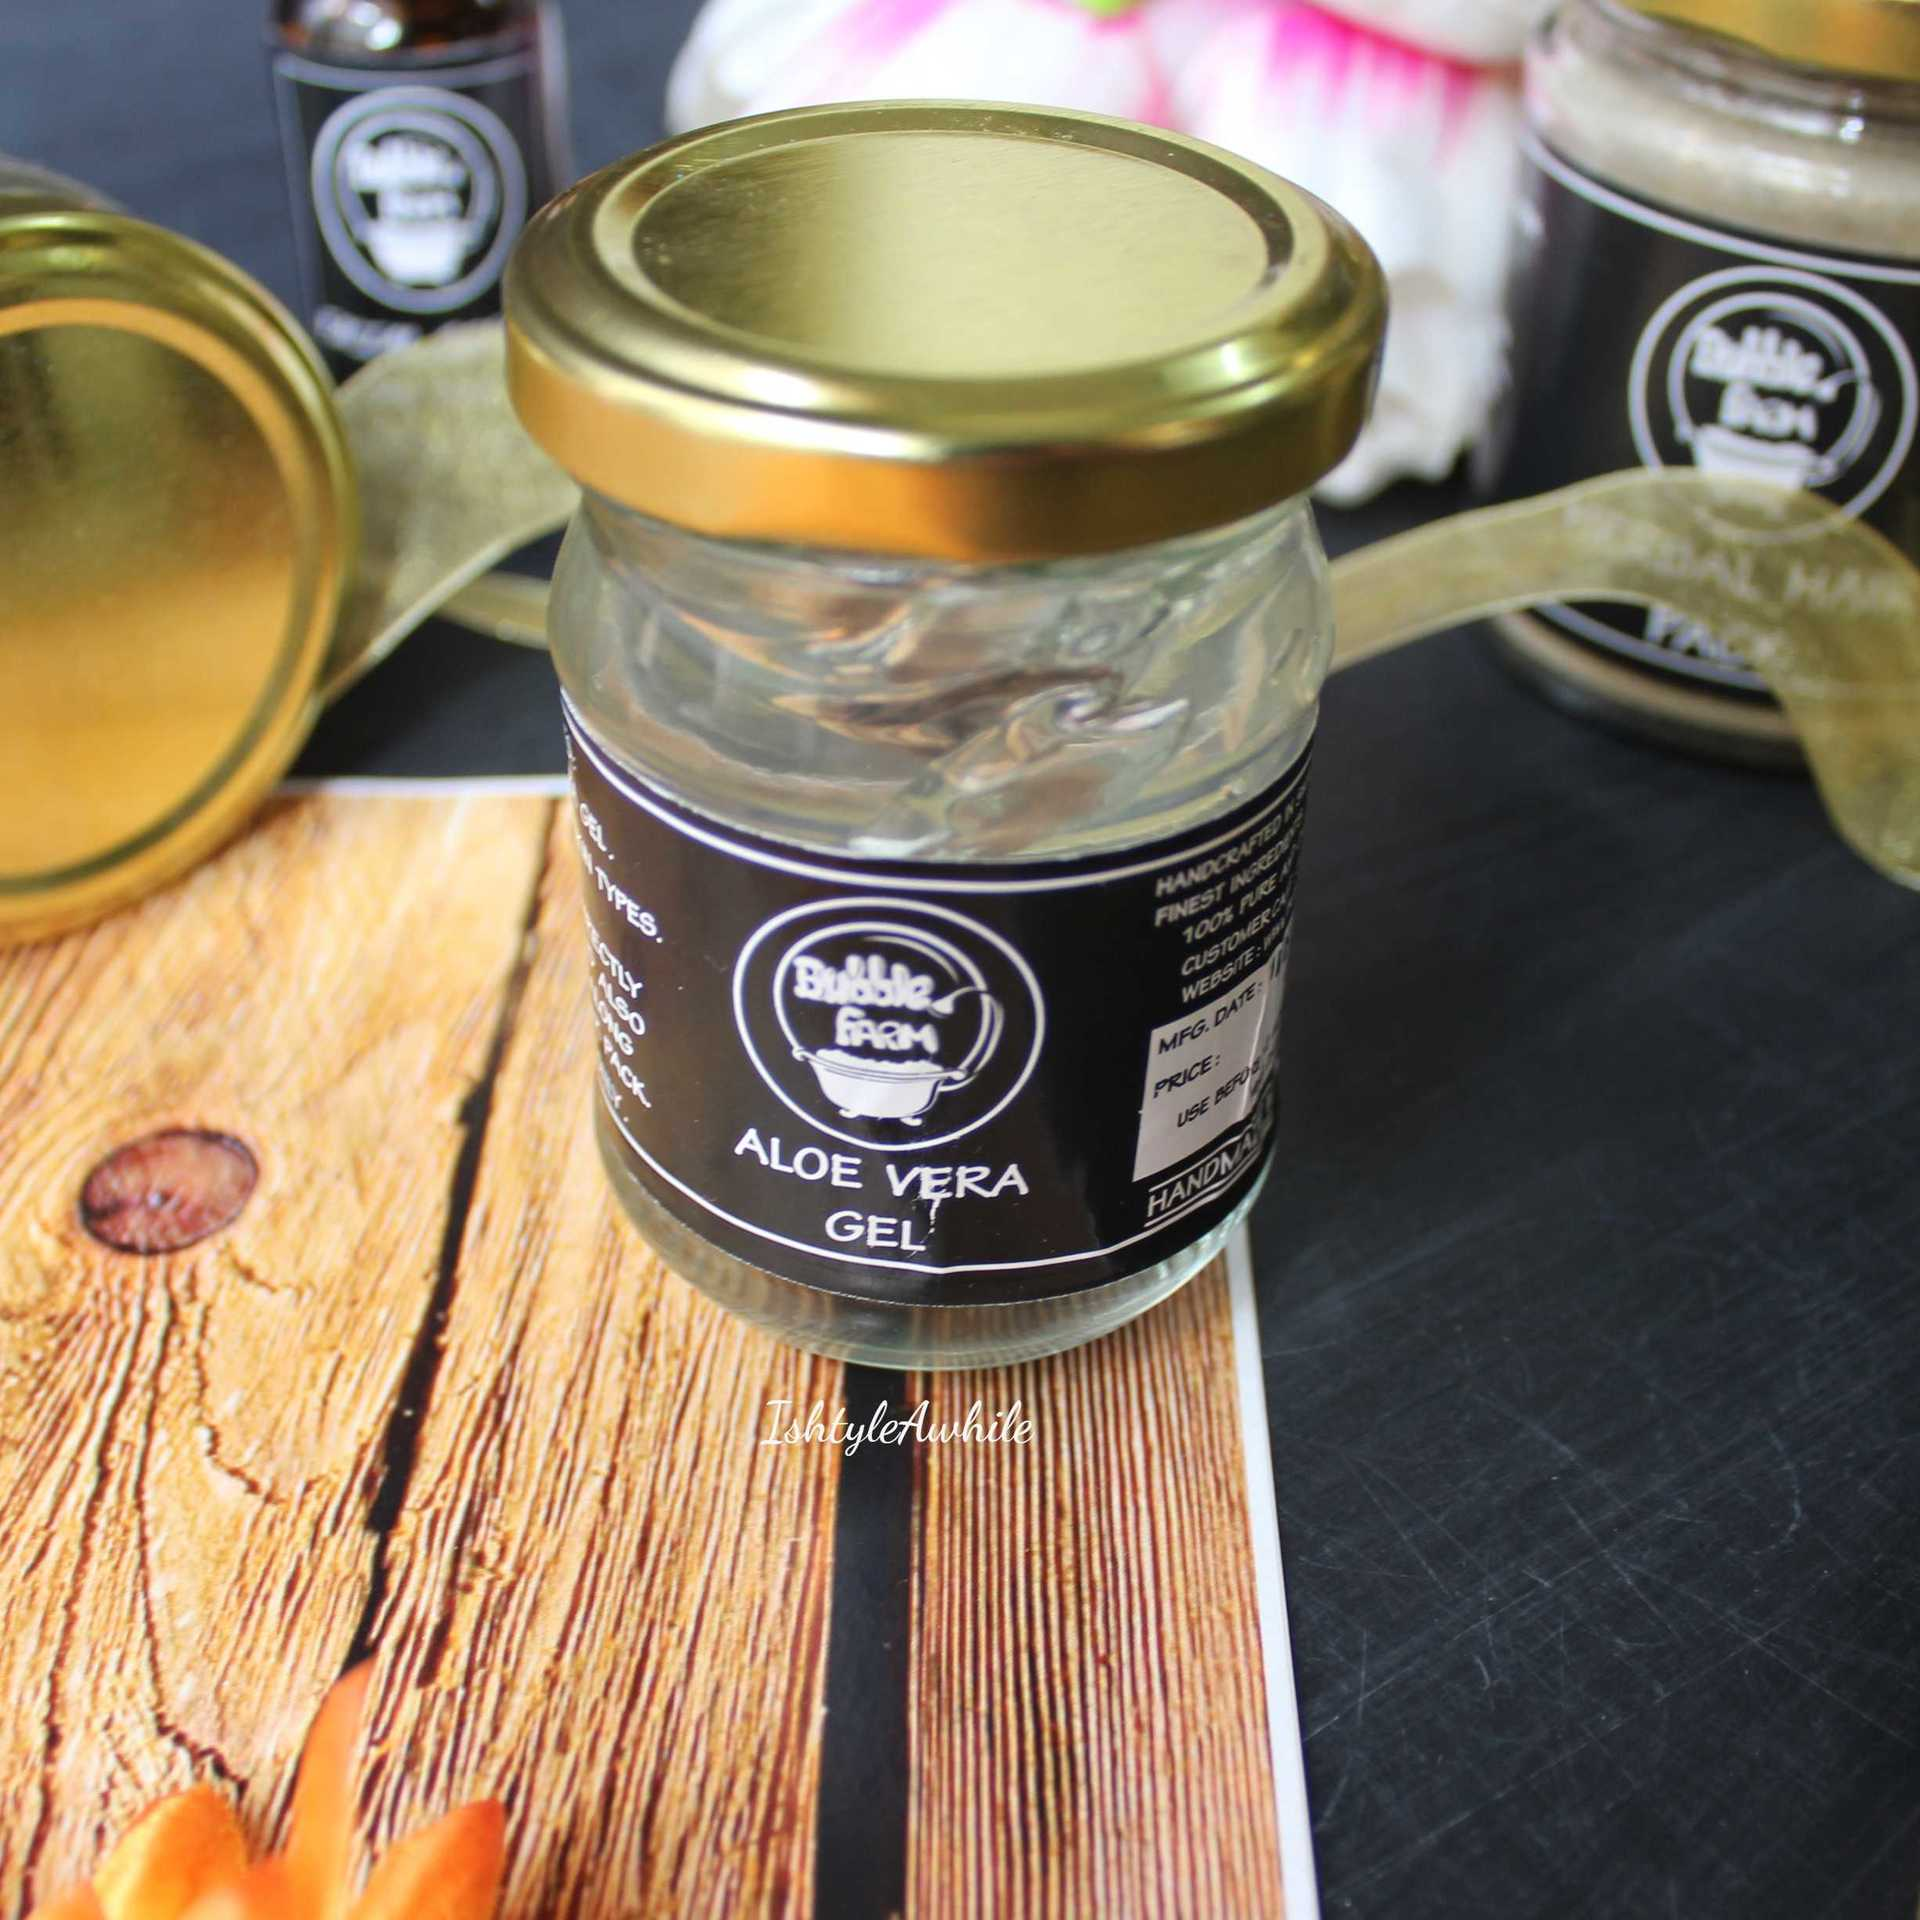 IshtyleAwhile - A Chennai based Indian Fashion Blog - Bubble Farm pure aloe vera gel